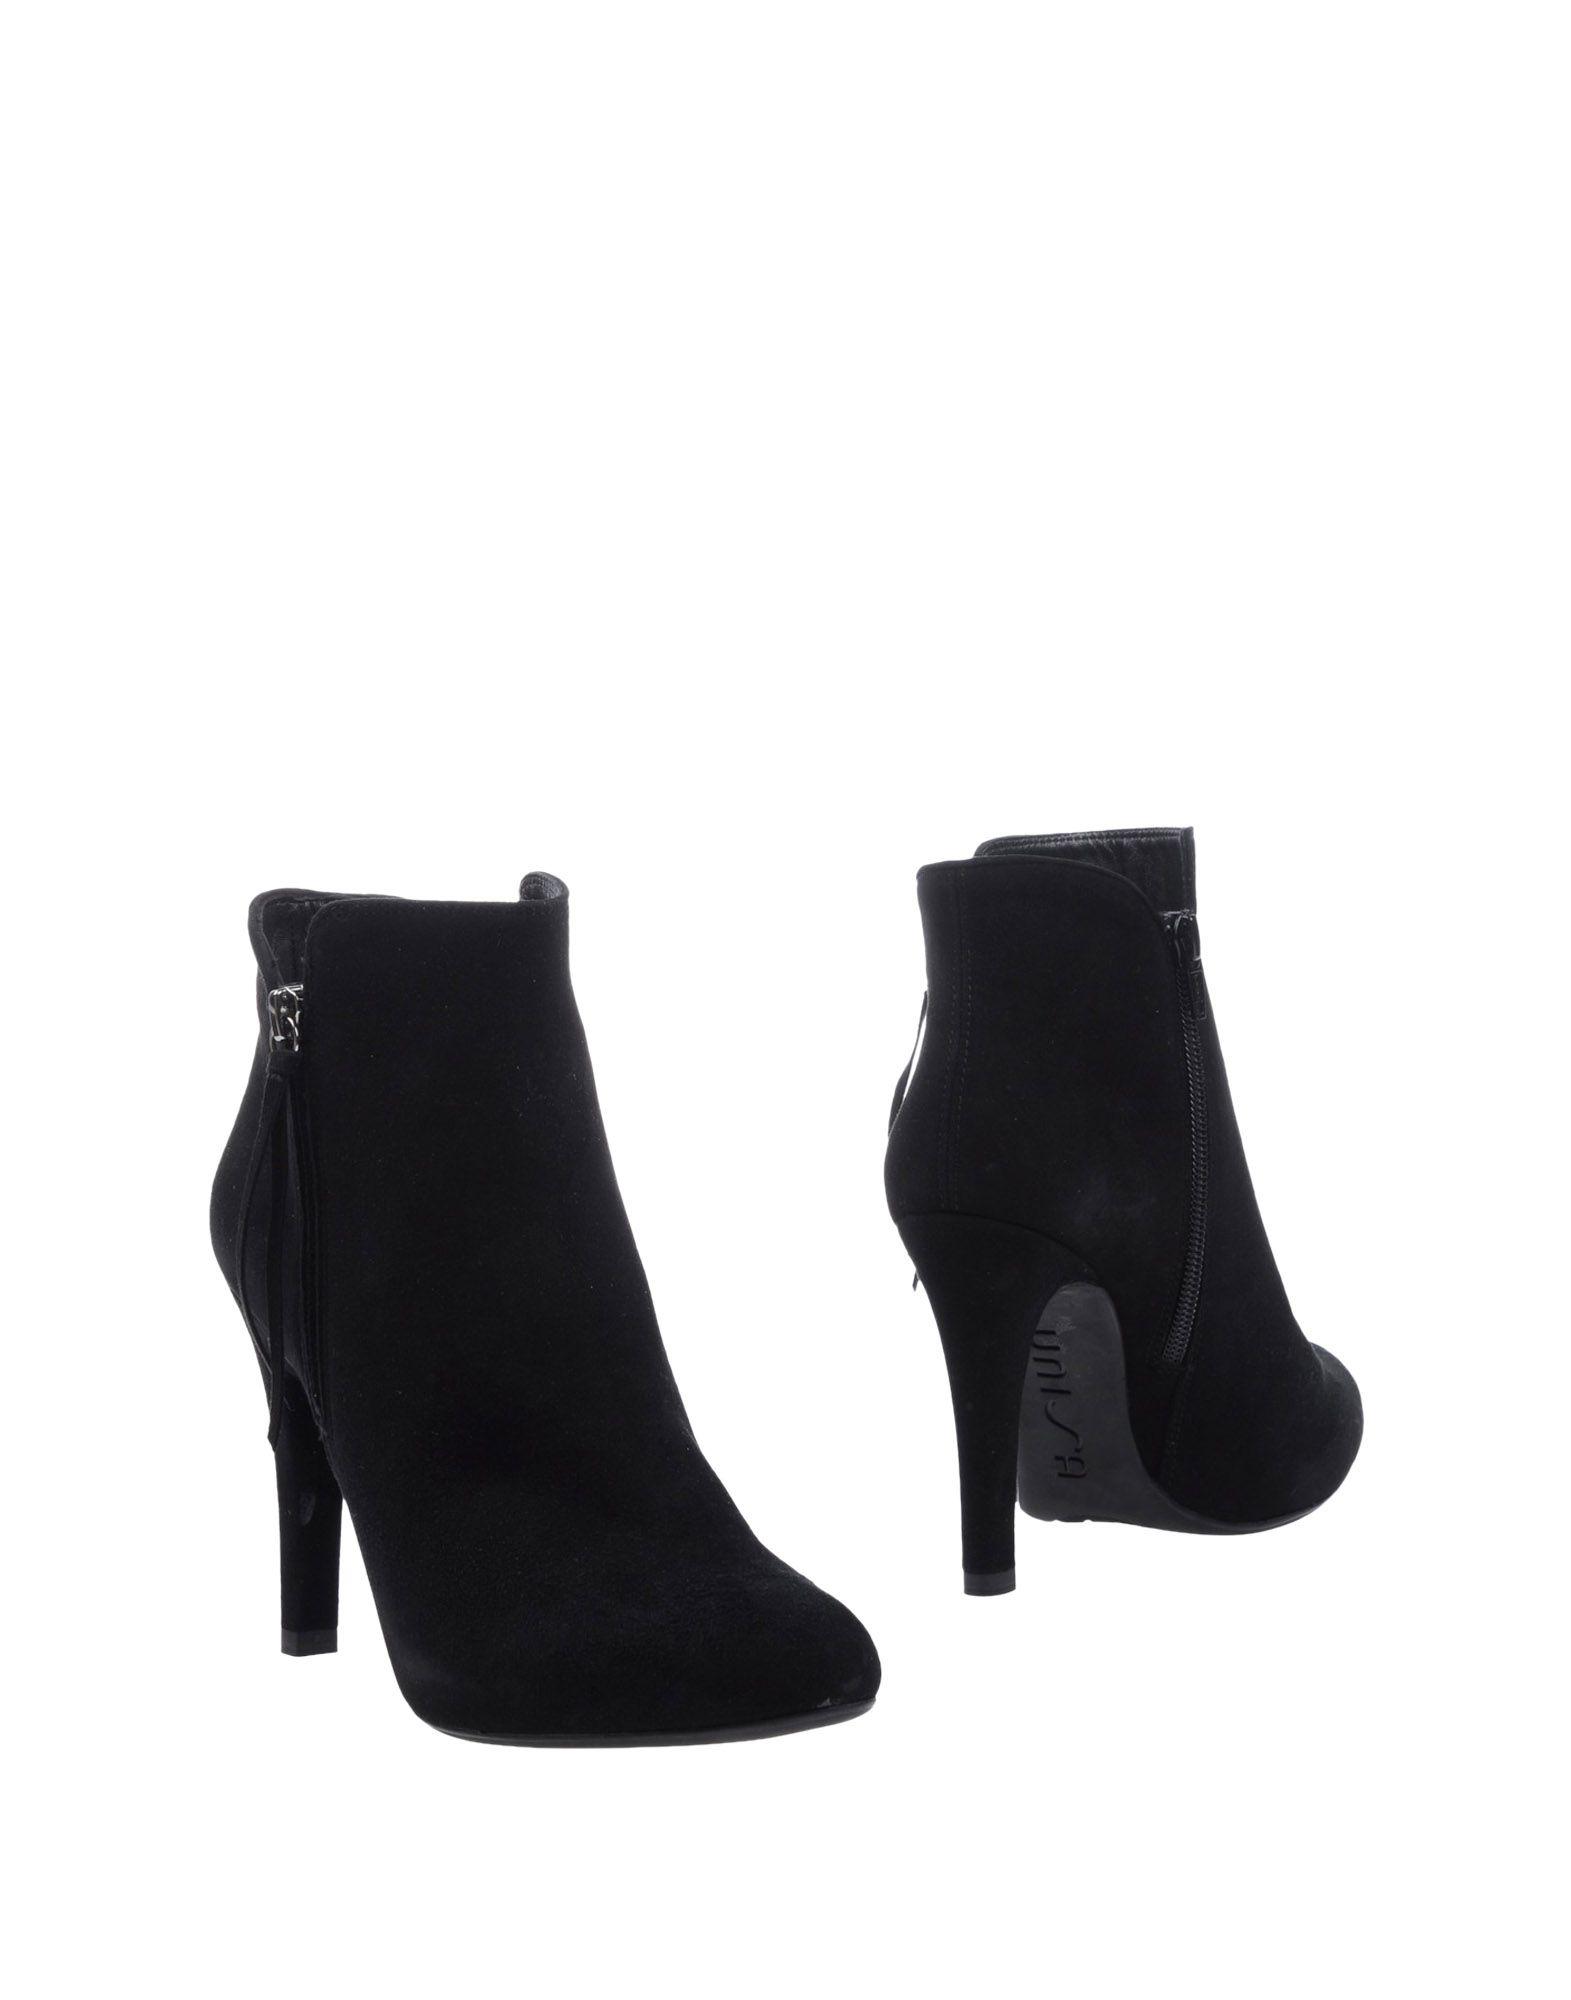 Unisa Stiefelette Damen  11299437XG Schuhe Gute Qualität beliebte Schuhe 11299437XG 86ad00